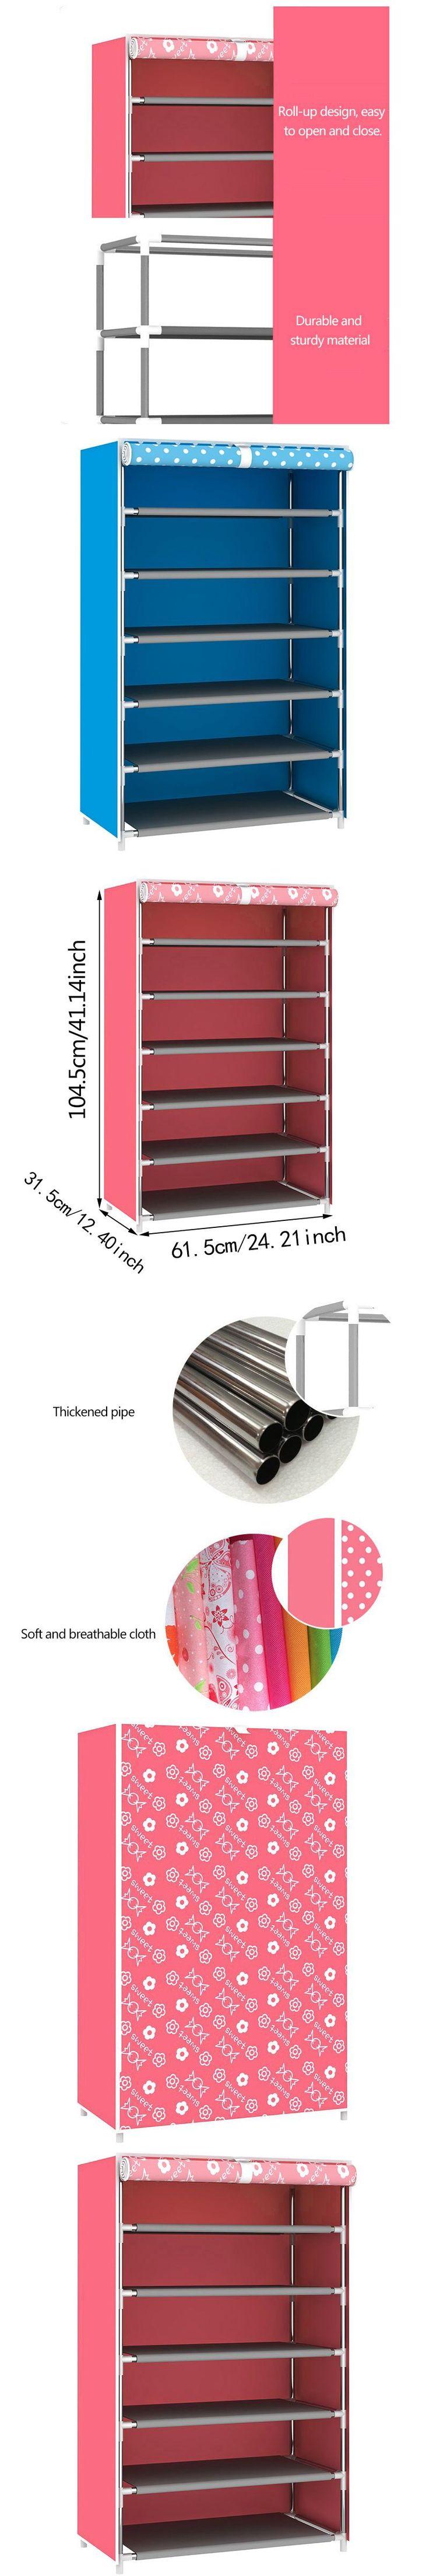 Hot Sale Non-Woven Fabric Shoe Rack Stand Shelf Dustproof Shoe Cabinet Multilayer Organizer Shoes Holder Pink Blue